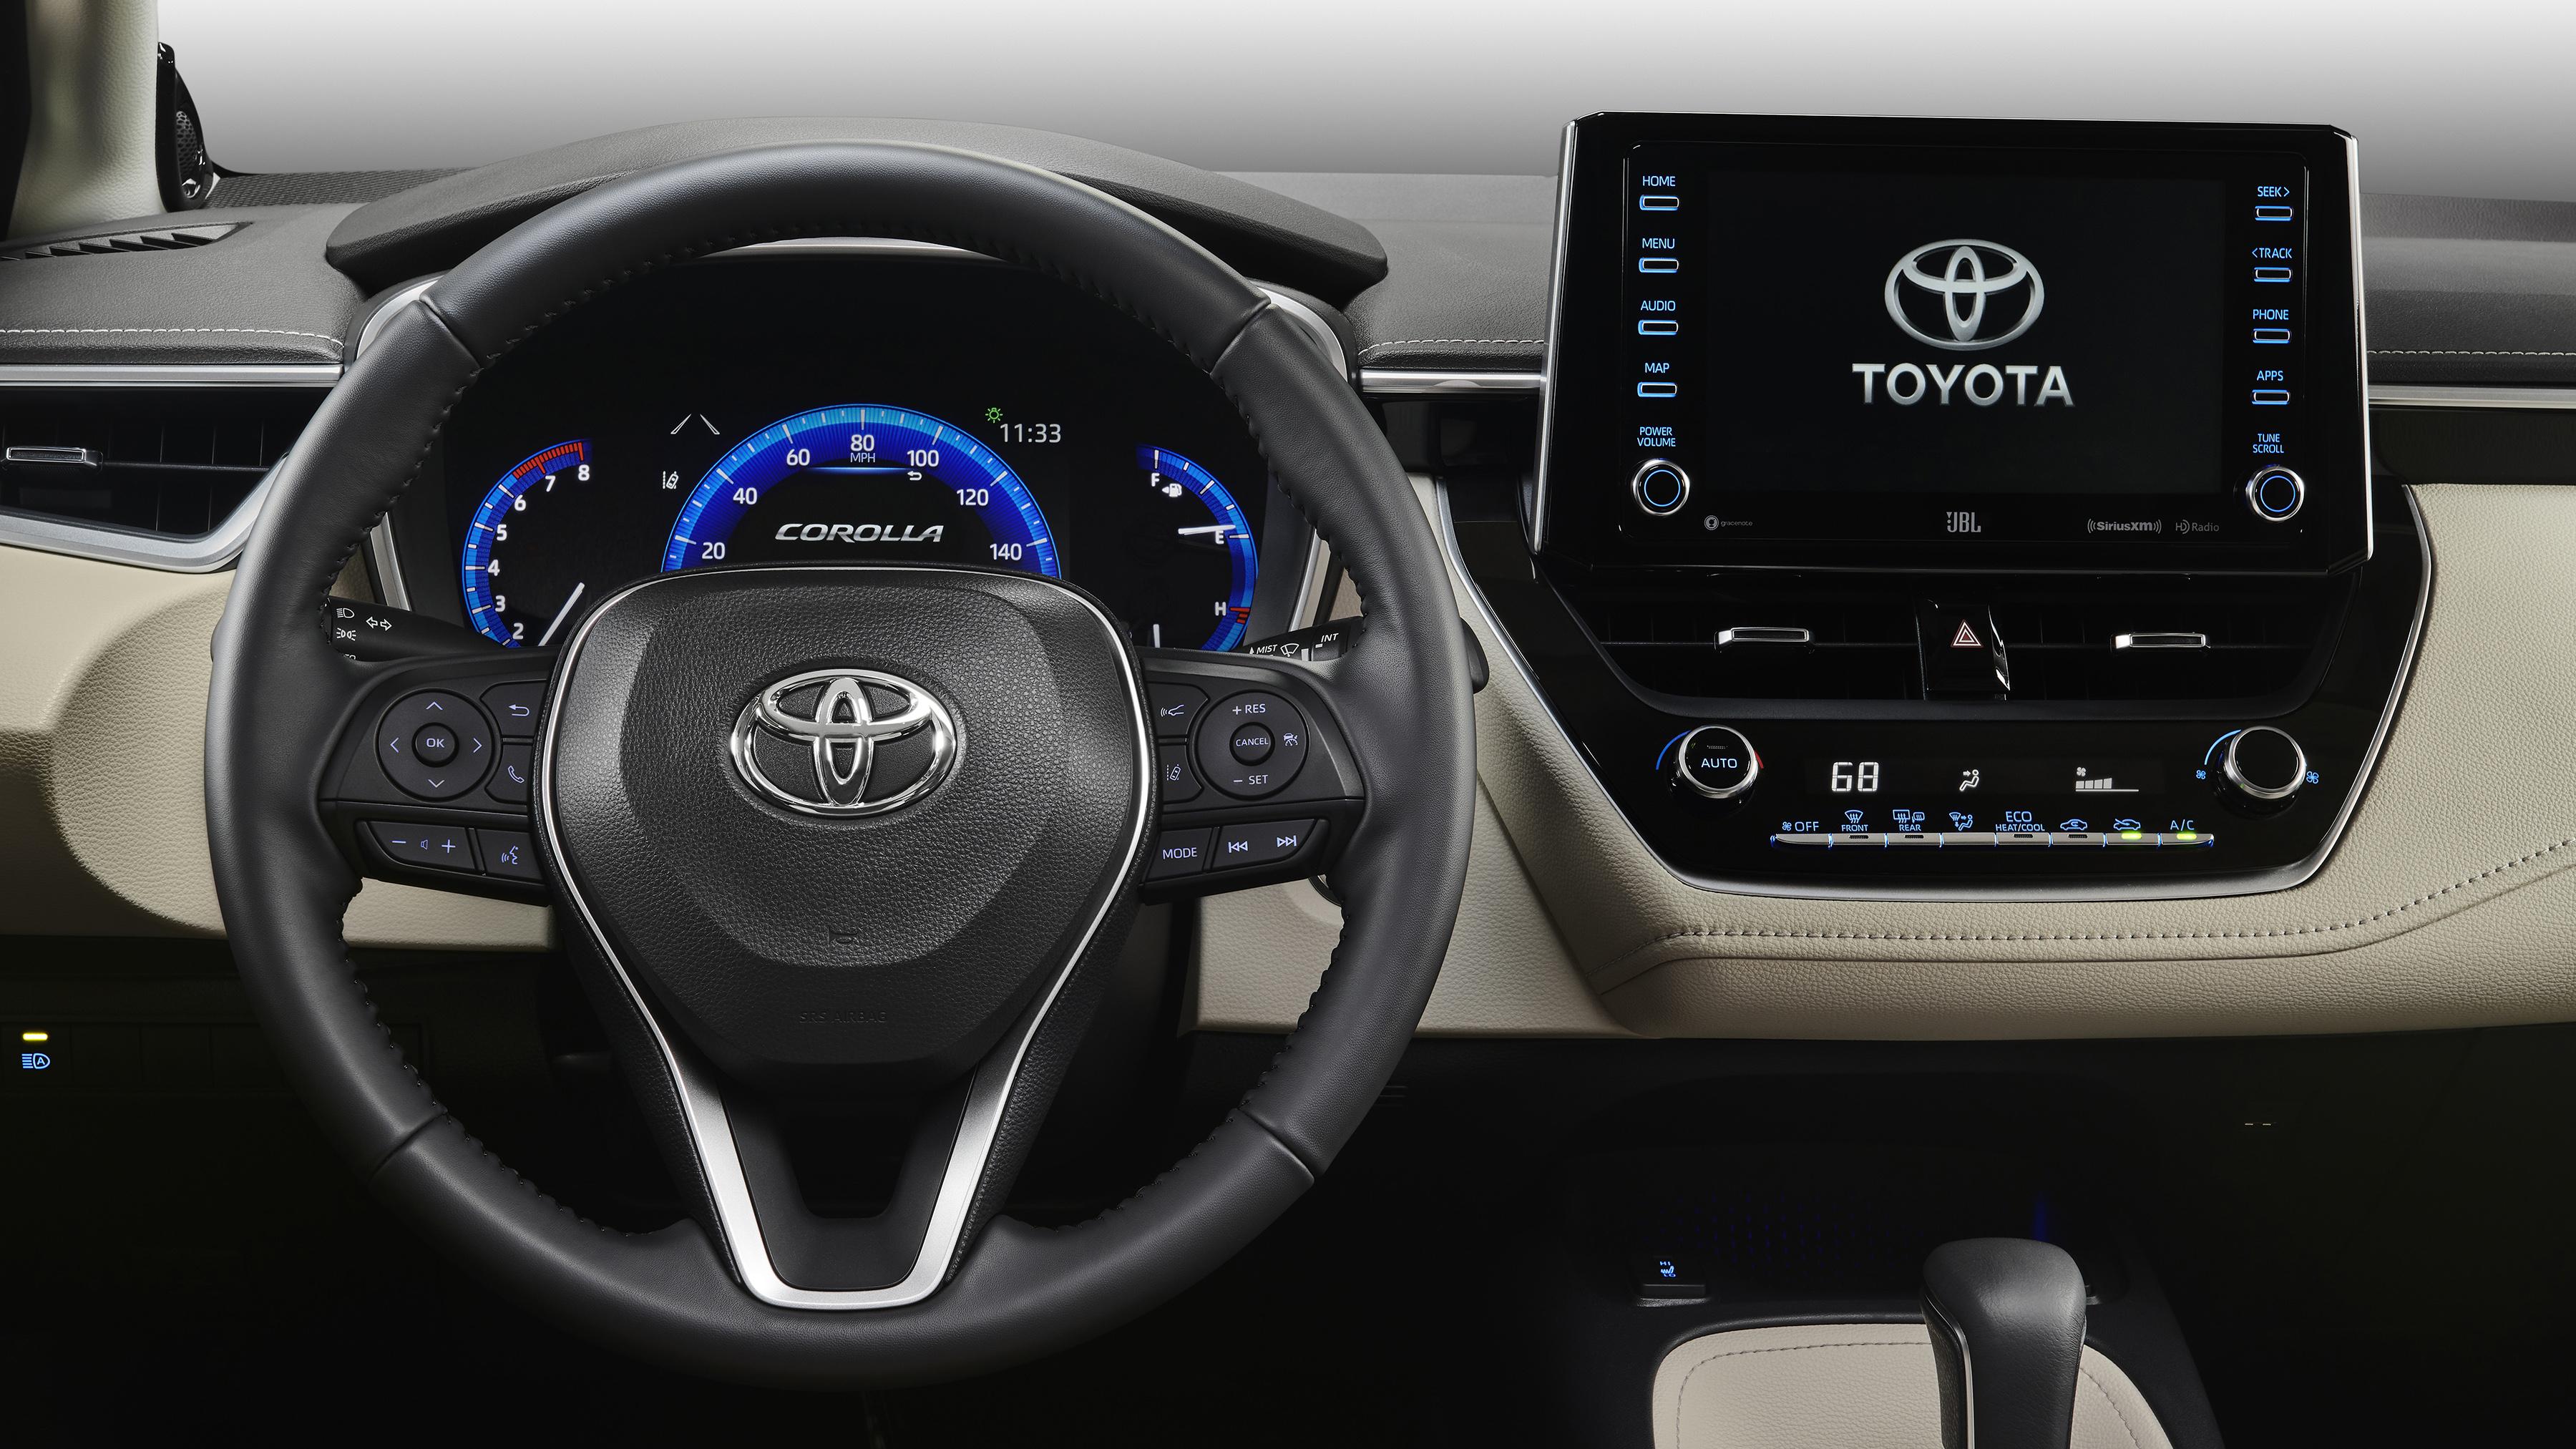 2020 Toyota Corolla Sedan Pricing And Specs Caradvice